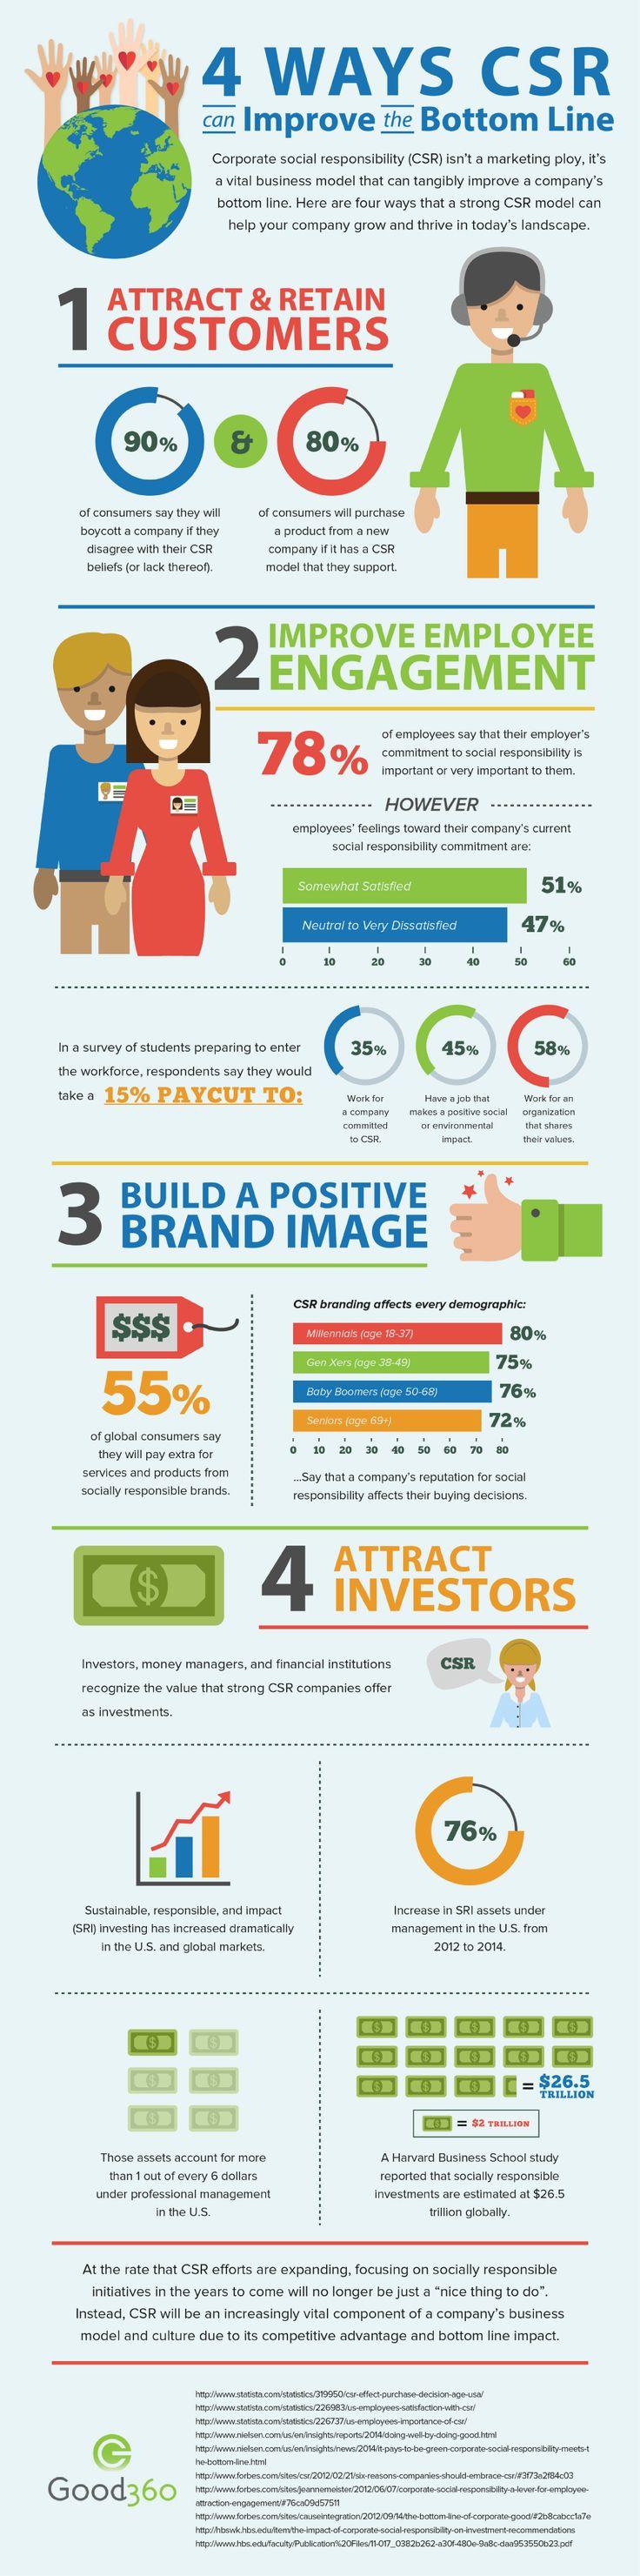 4 Ways CSR Can Improve Your Company's Bottom Line | Good360 - Good360